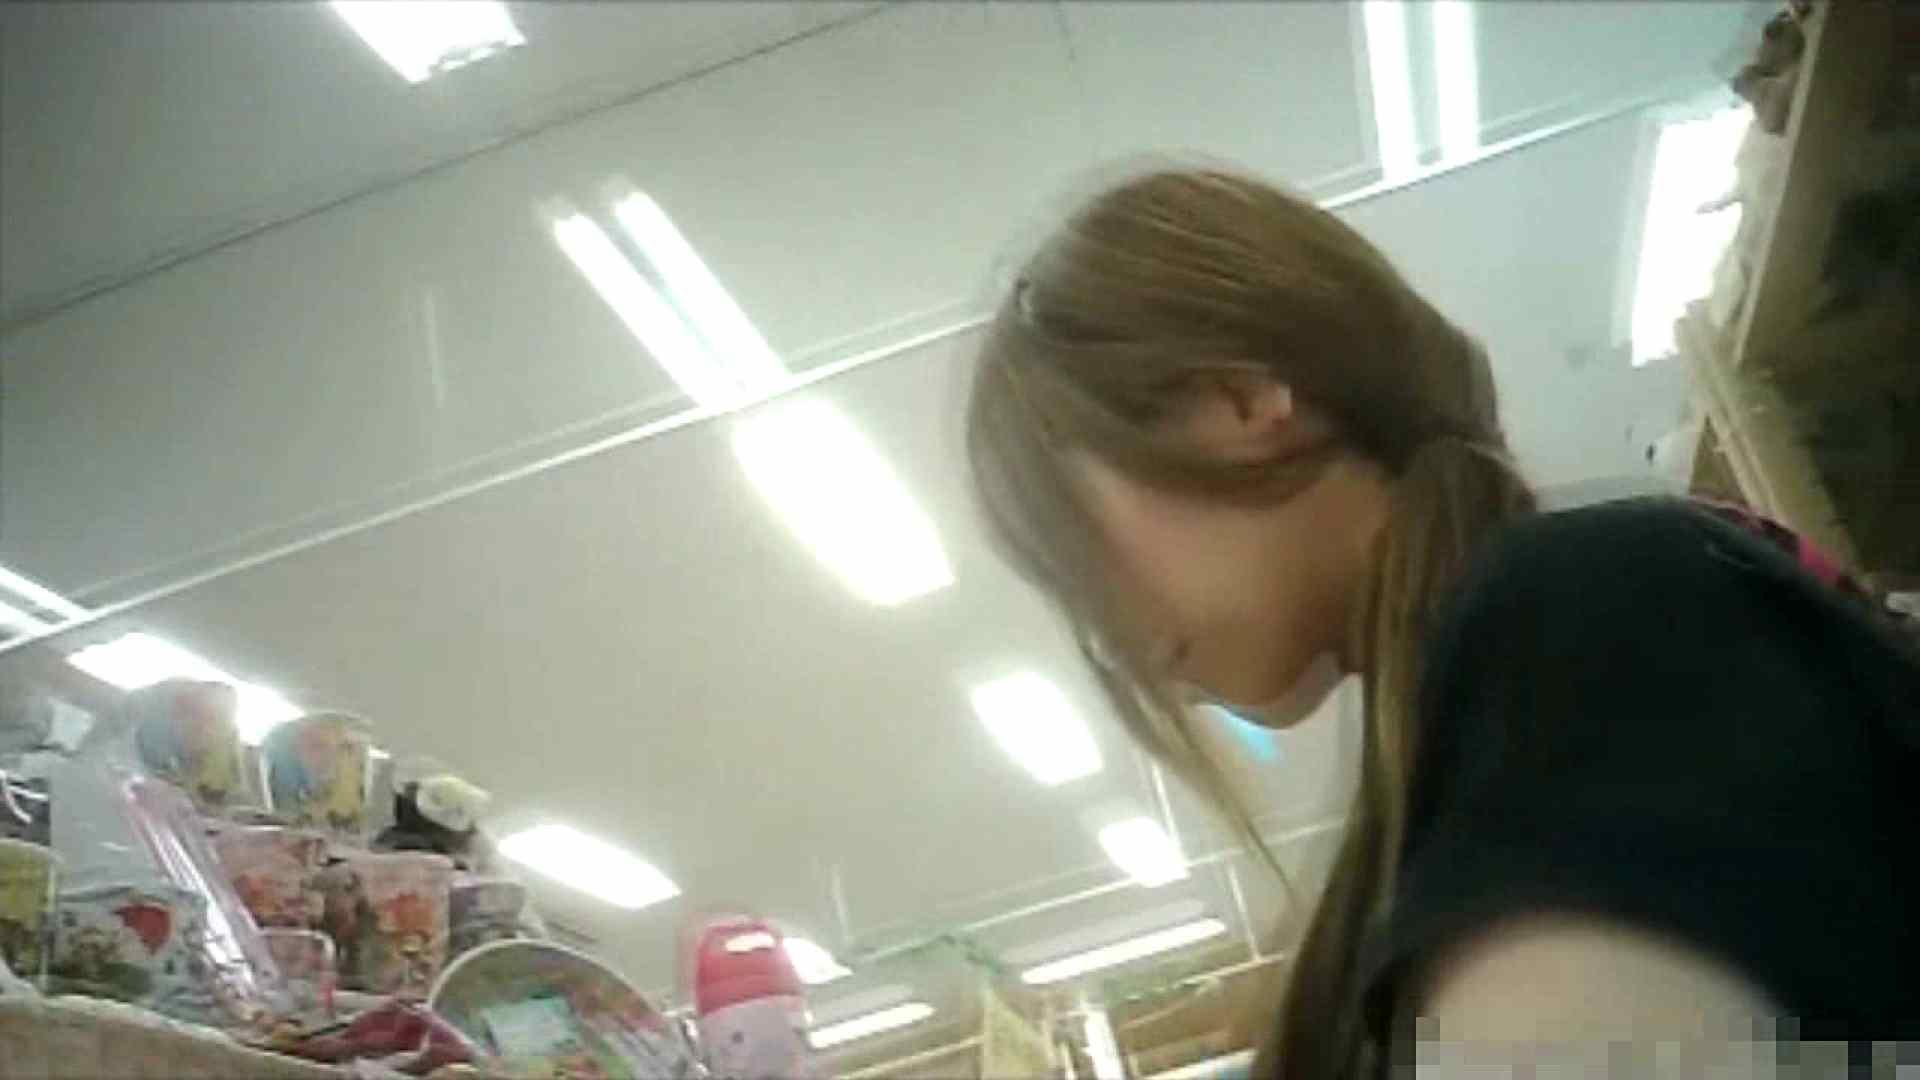 NO.6 雑貨屋で買い物中のガーリーな女の子 胸チラ・のぞき AV無料 95枚 39